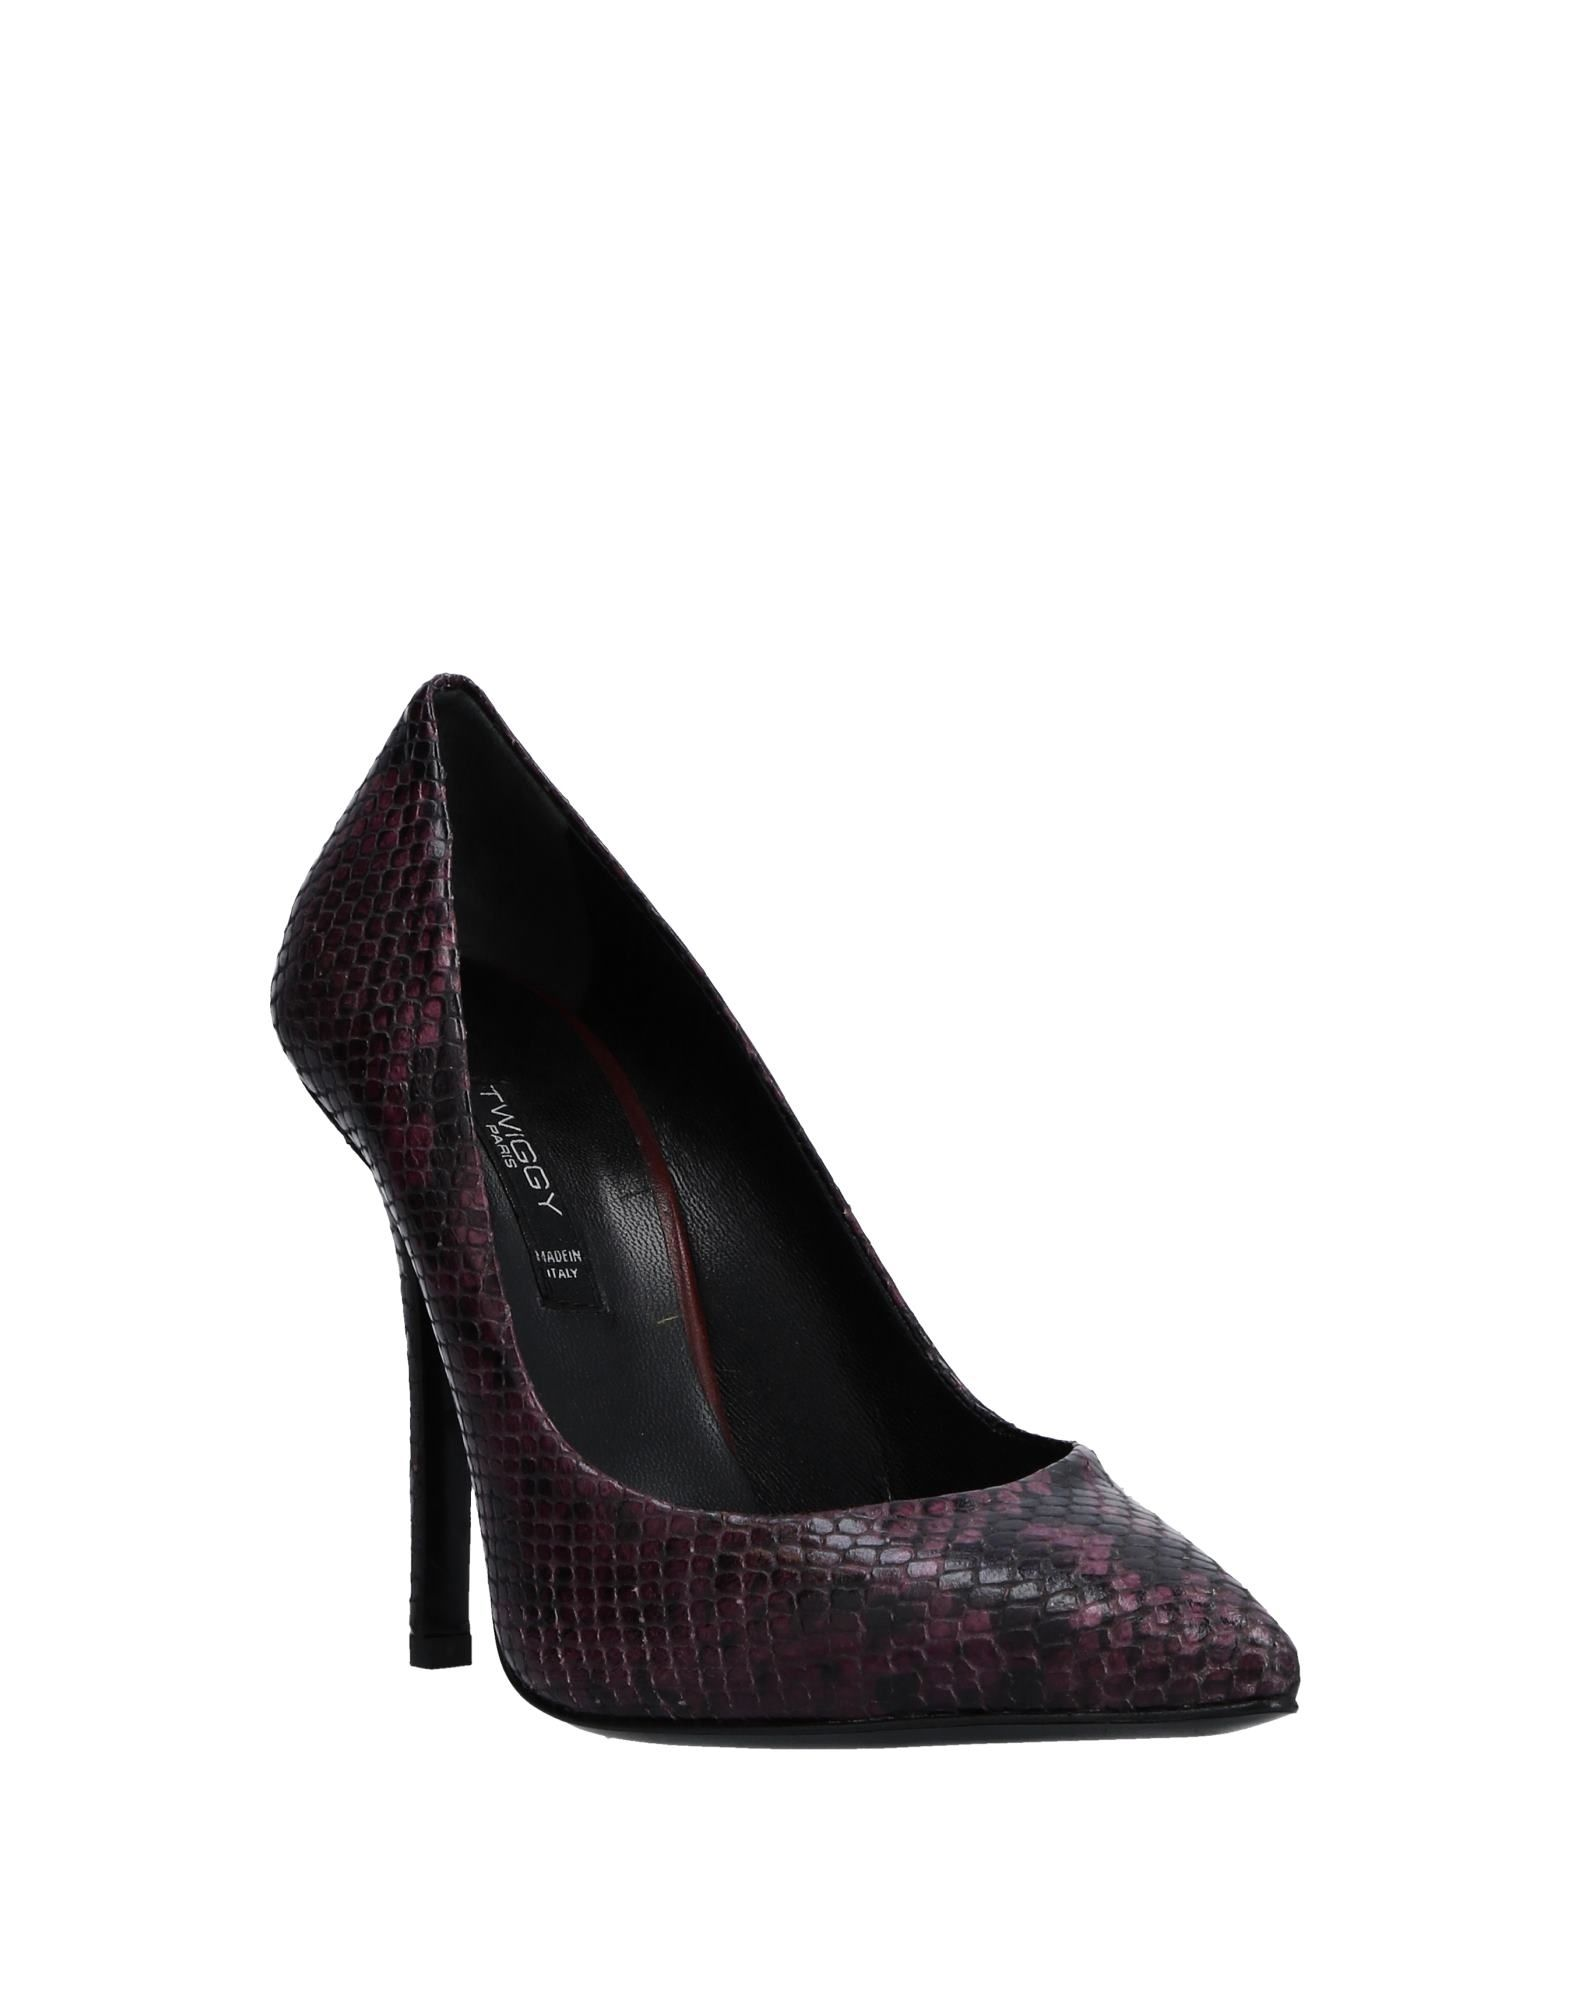 Twiggy Schuhe Pumps Damen  11527202UH Gute Qualität beliebte Schuhe Twiggy bfd1bd